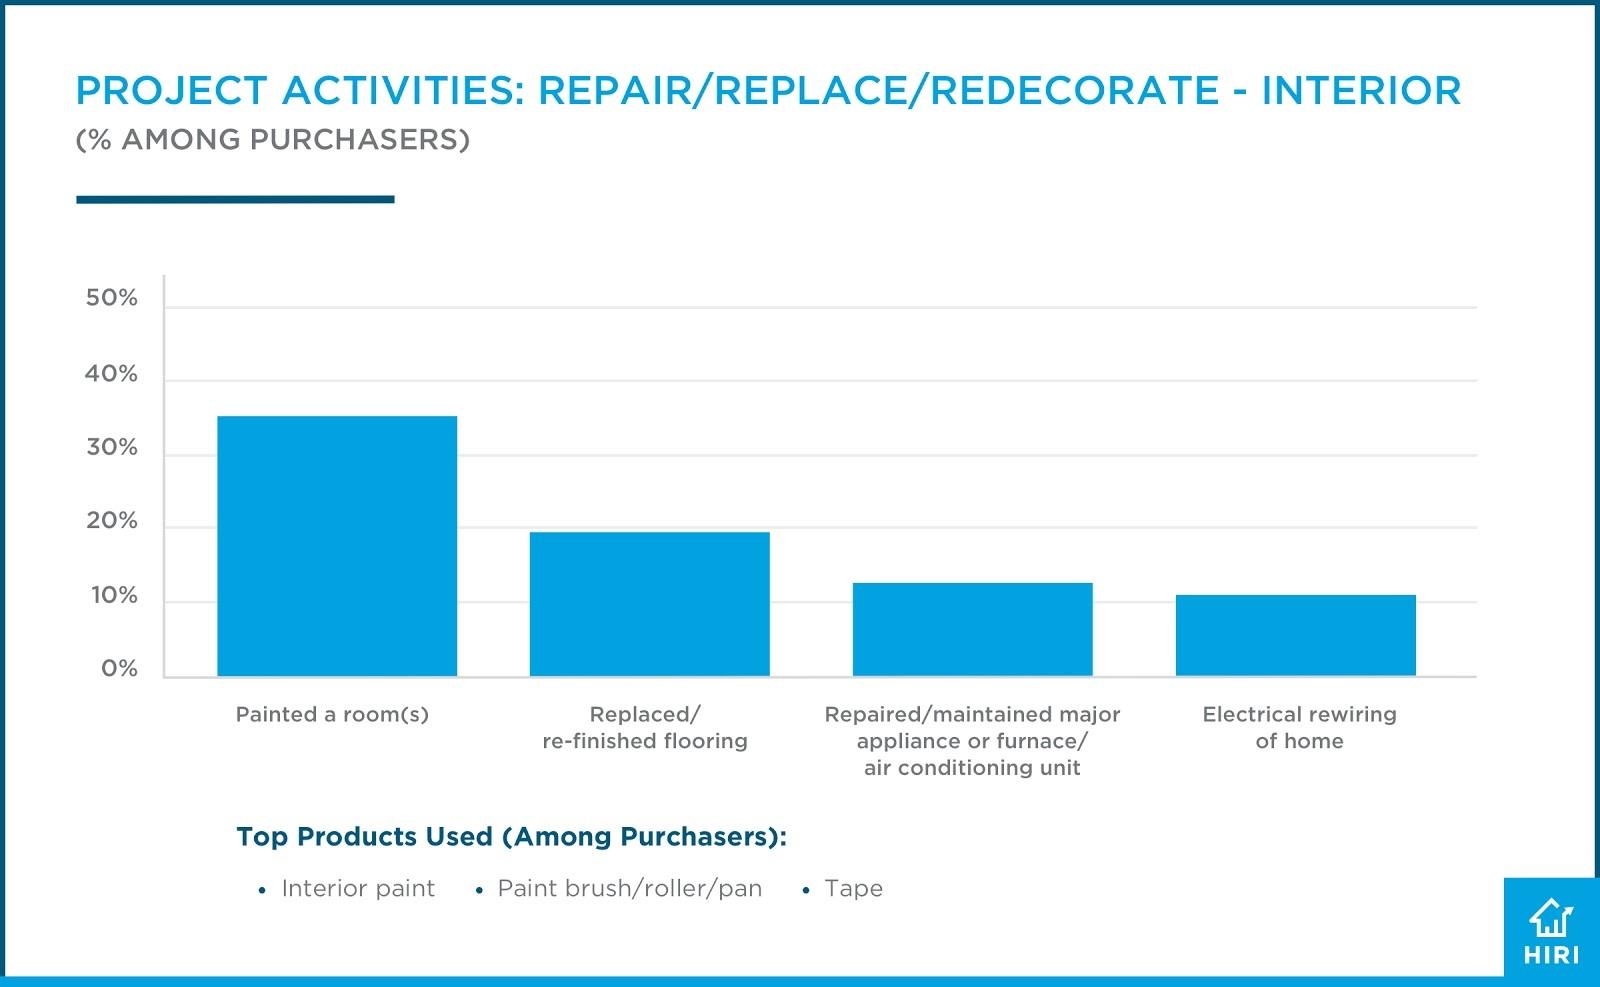 HIRI DIY Project Activities-Repair, Replace, Redecorate Interior